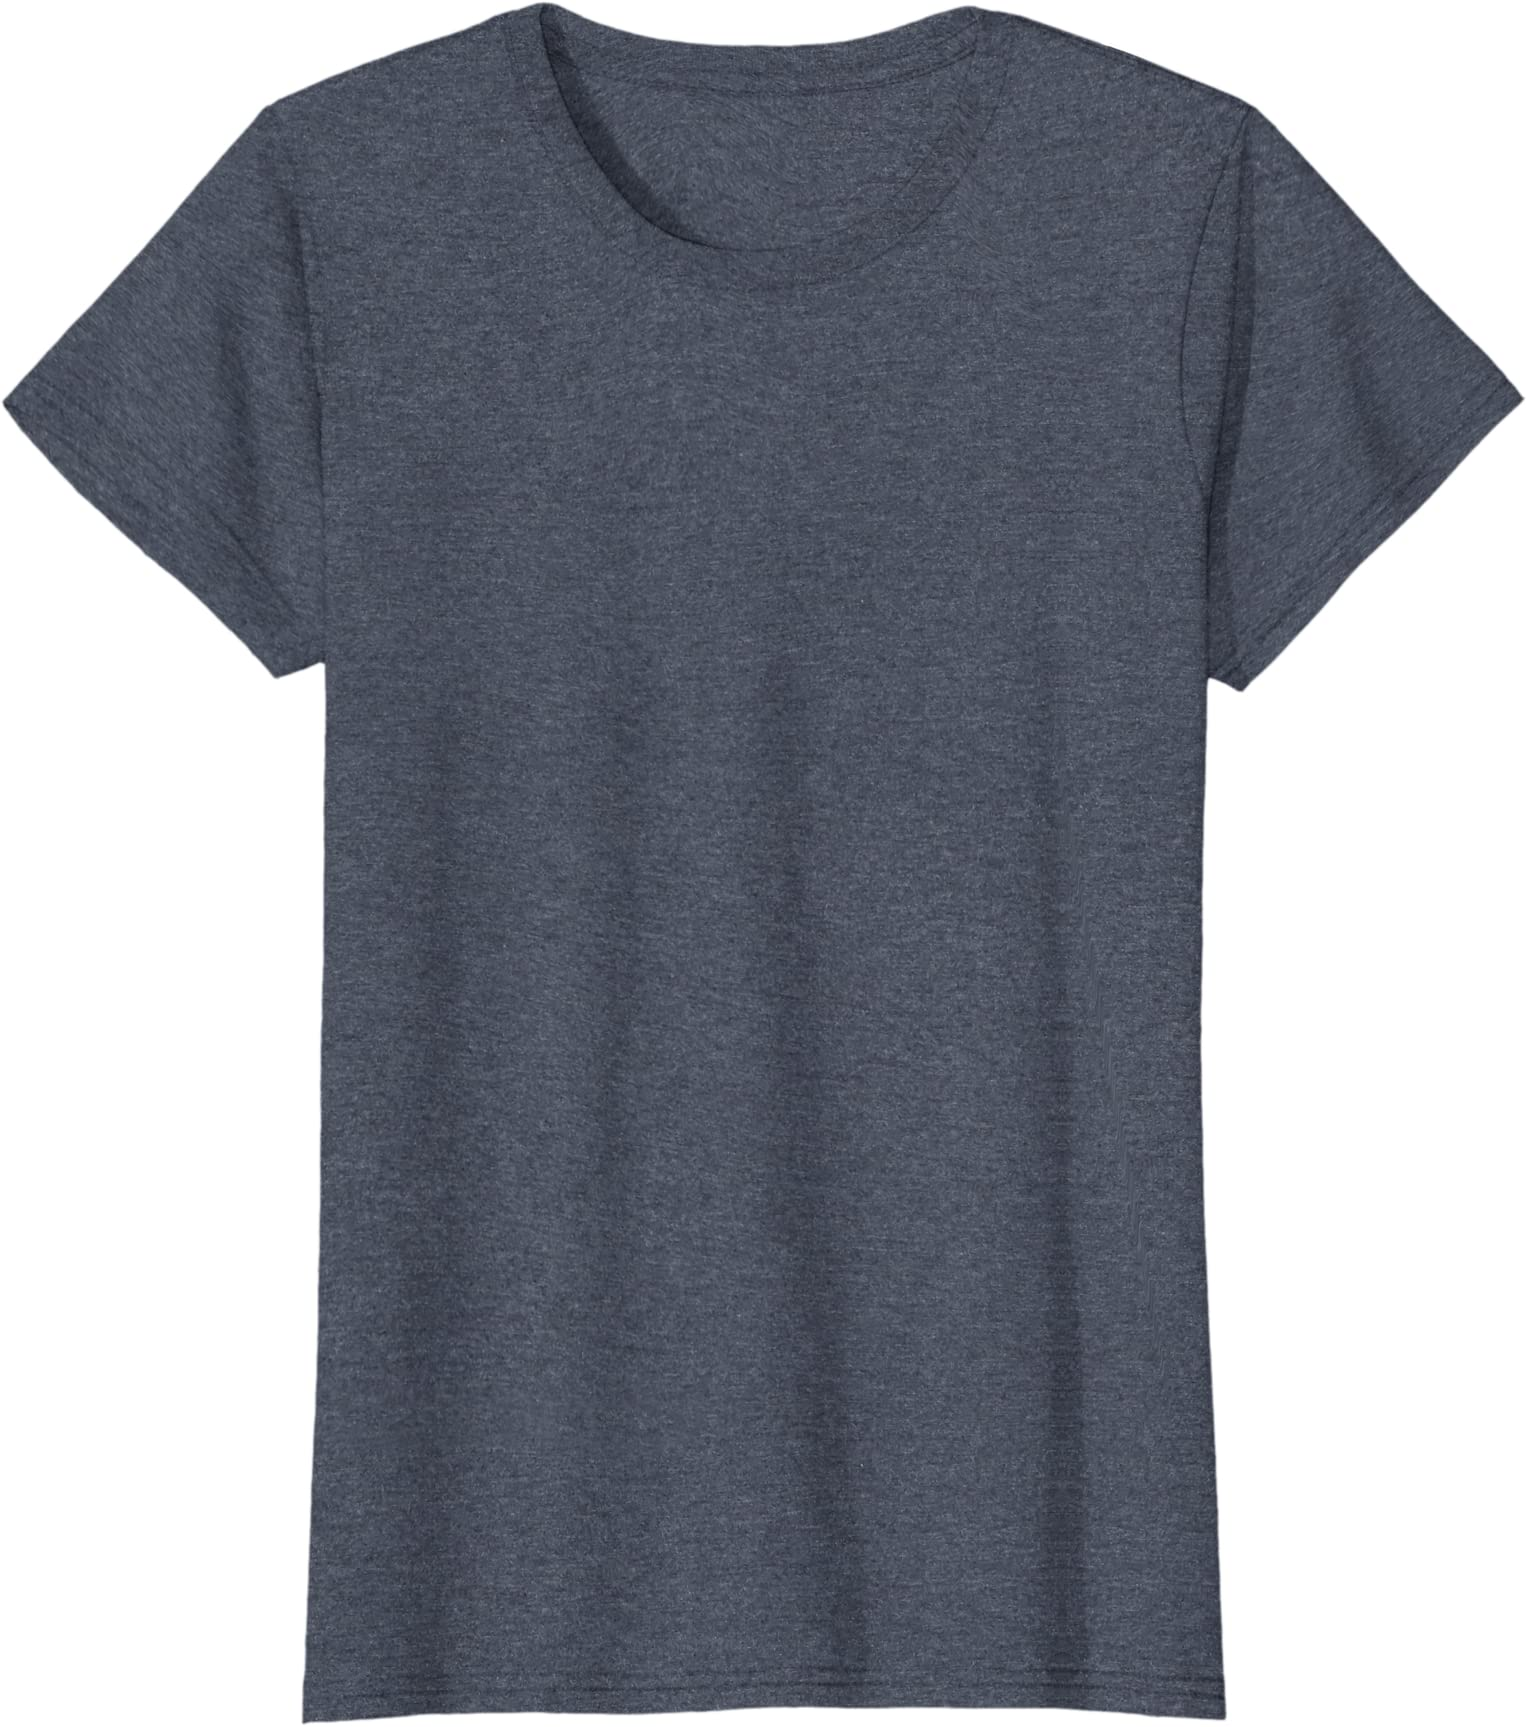 Dabbing Cat 1 Tees-Youth Short Sleeve Tee Kids Short T Shirts